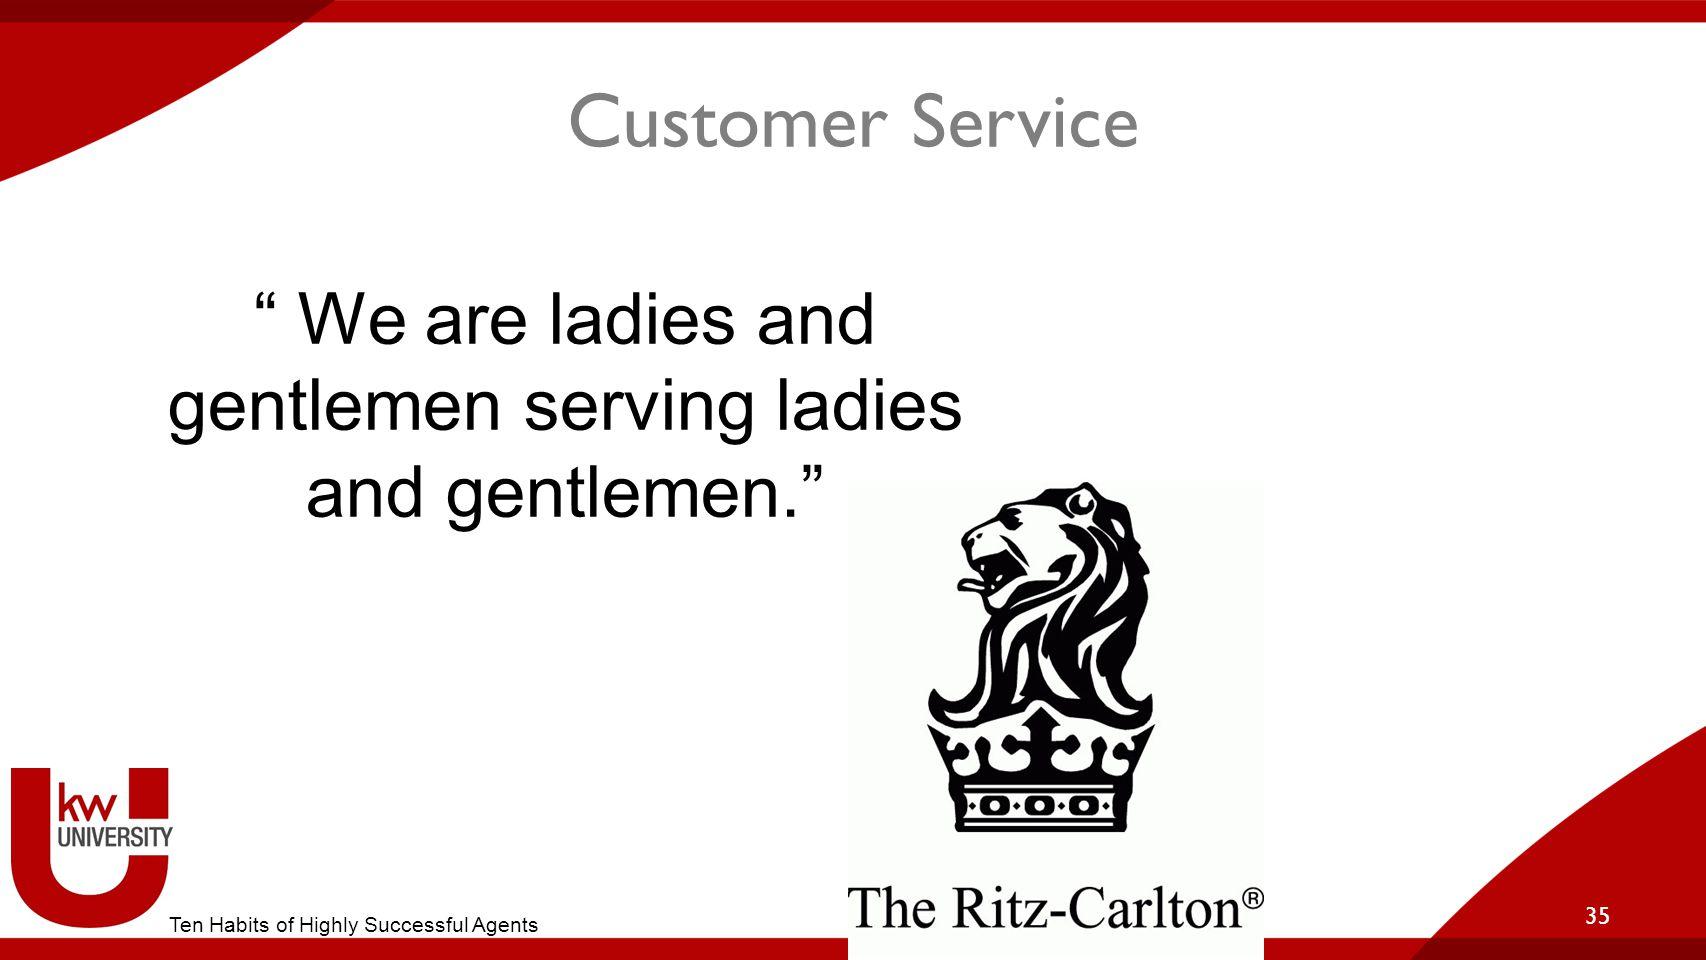 Customer Service 35 We are ladies and gentlemen serving ladies and gentlemen. Ten Habits of Highly Successful Agents